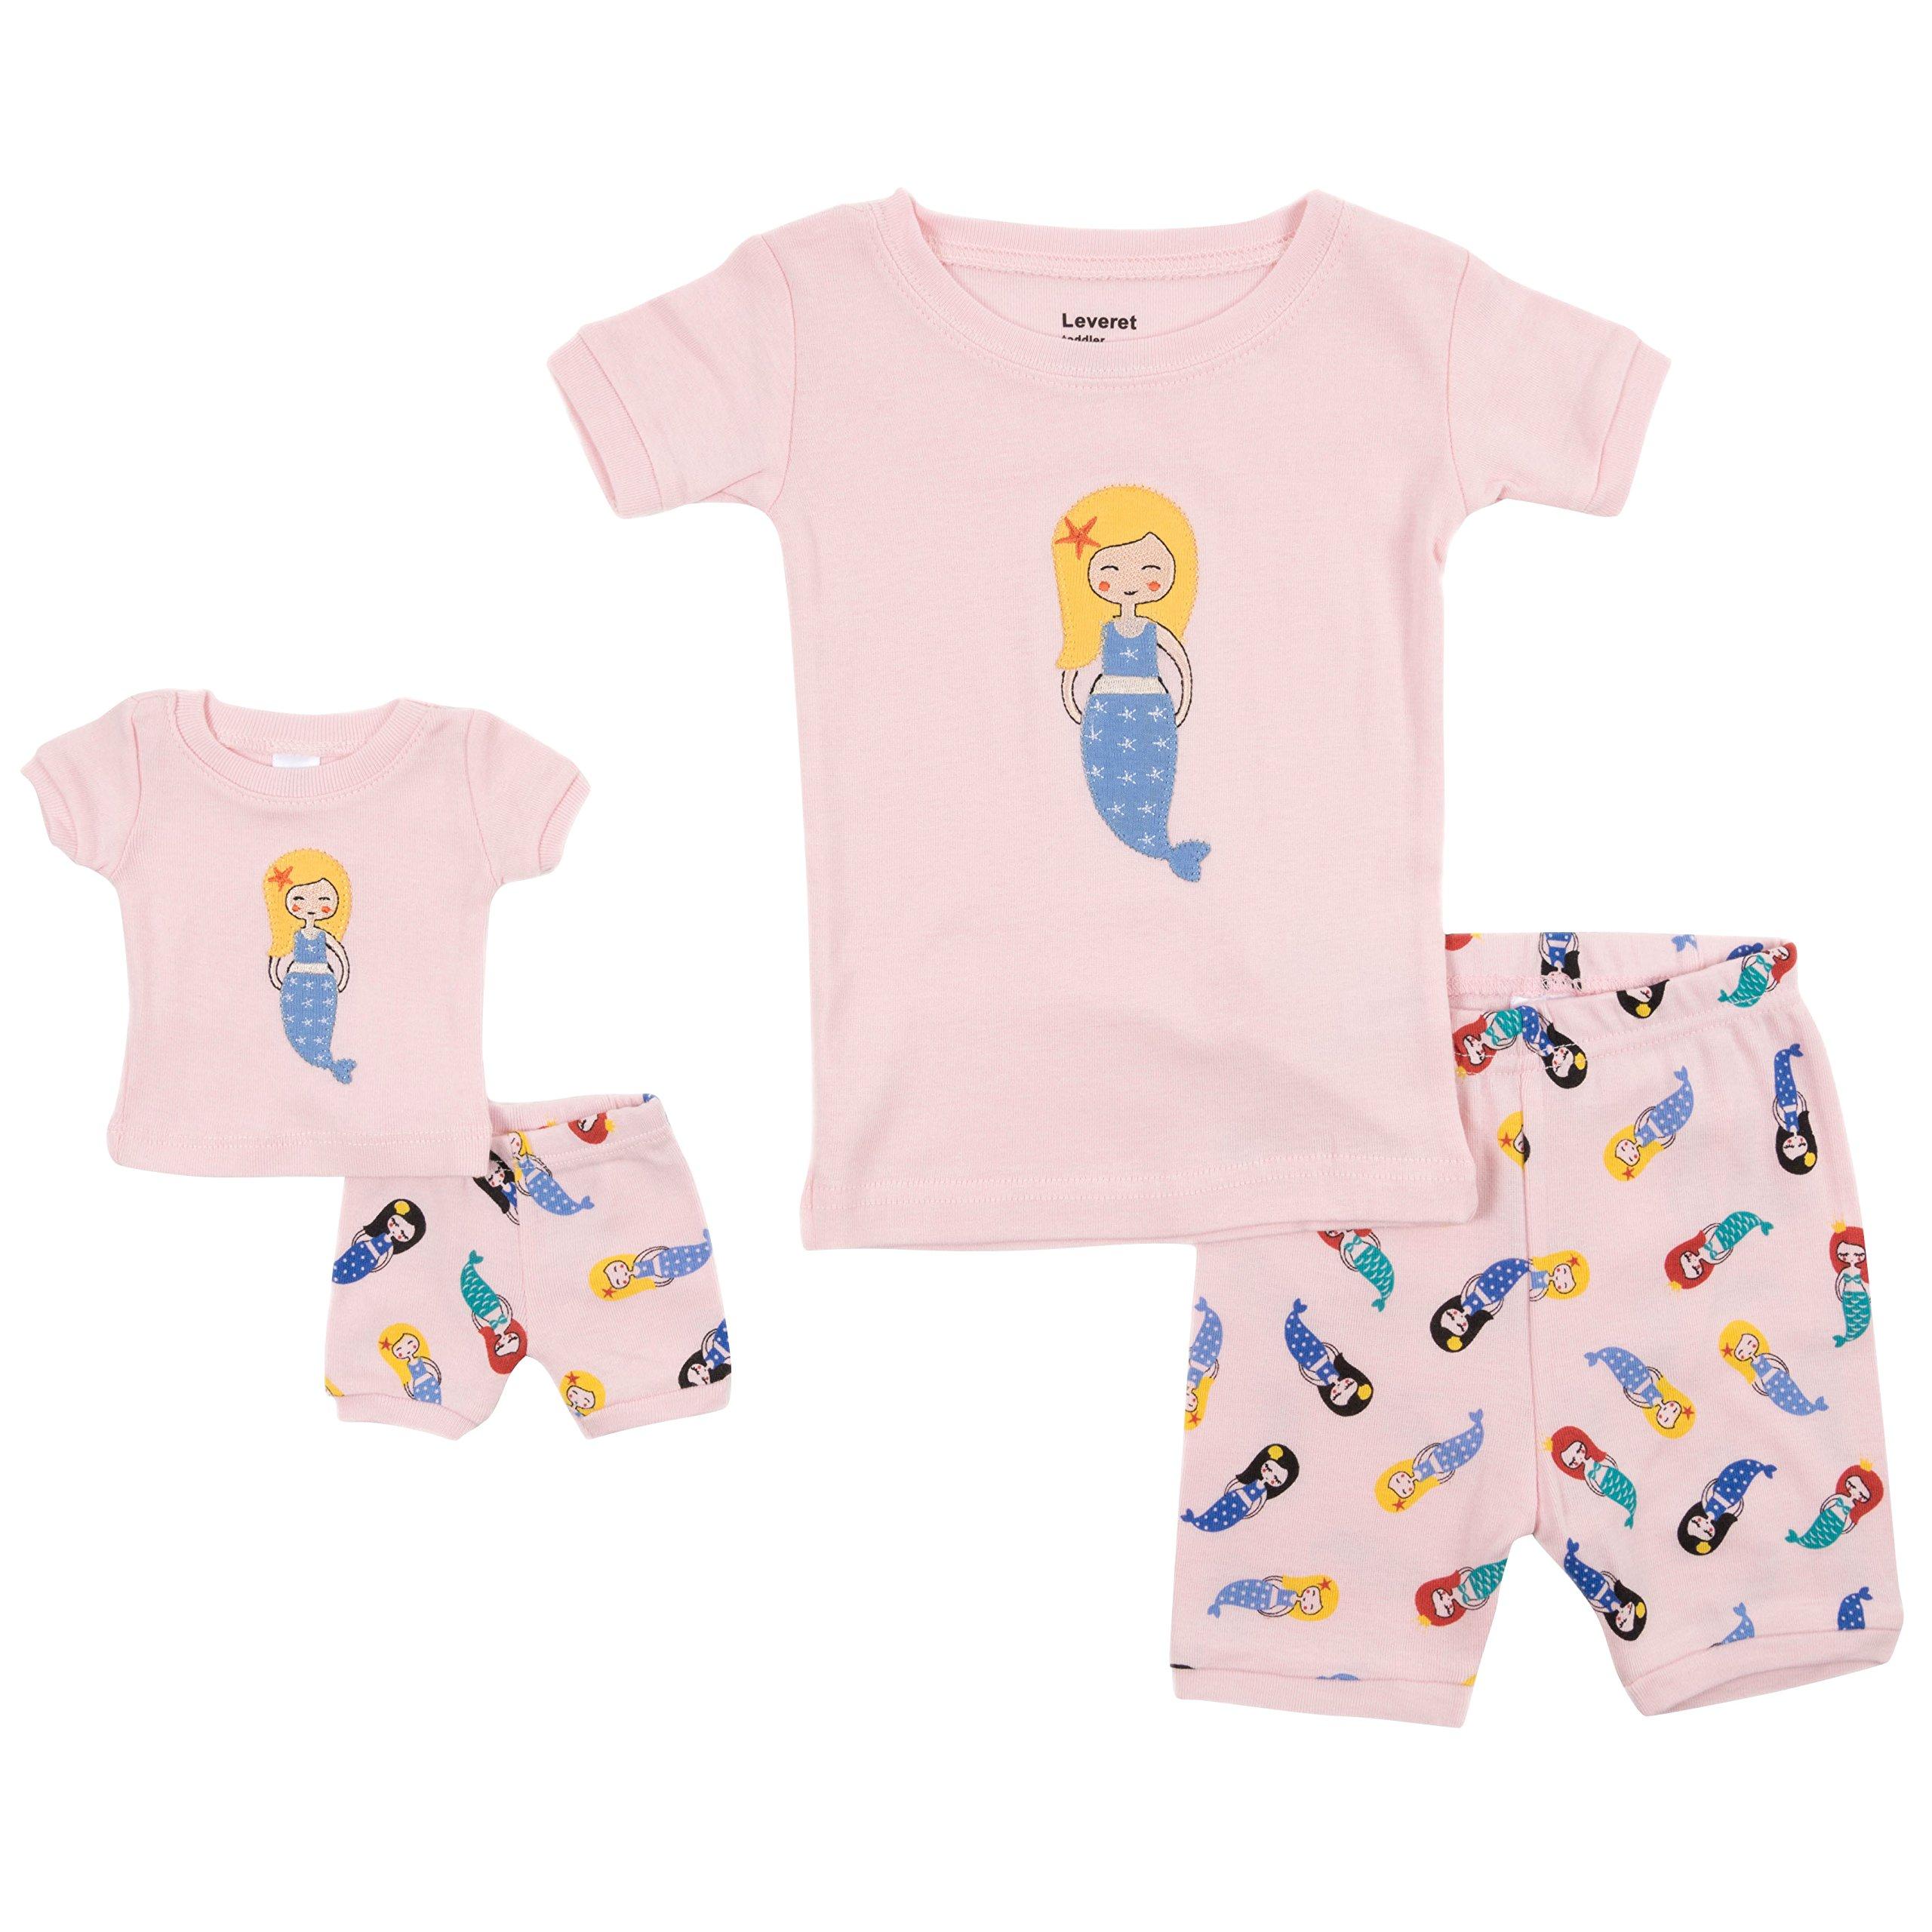 Leveret Shorts Matching Doll & Girl Mermaid 2 Piece Pajama Set 100% Cotton Size 8 Years